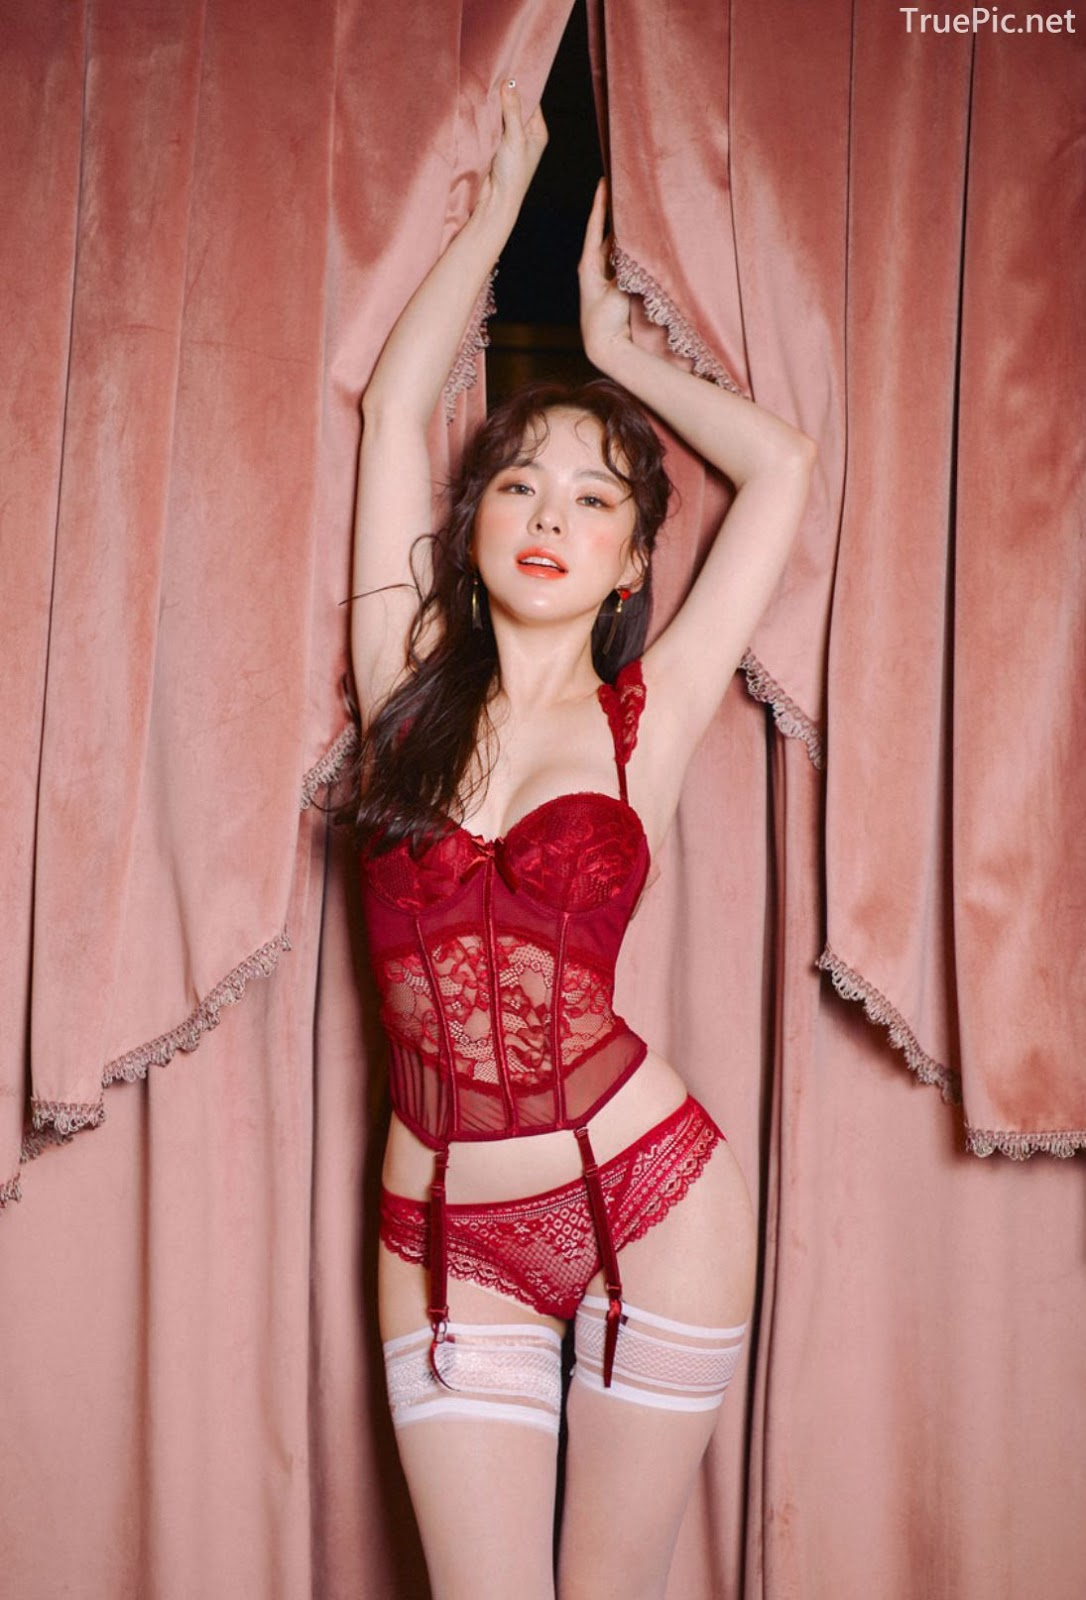 Korean lingerie queen Haneul - Valentine Sexy Lingerie Set - TruePic.net - Picture 4